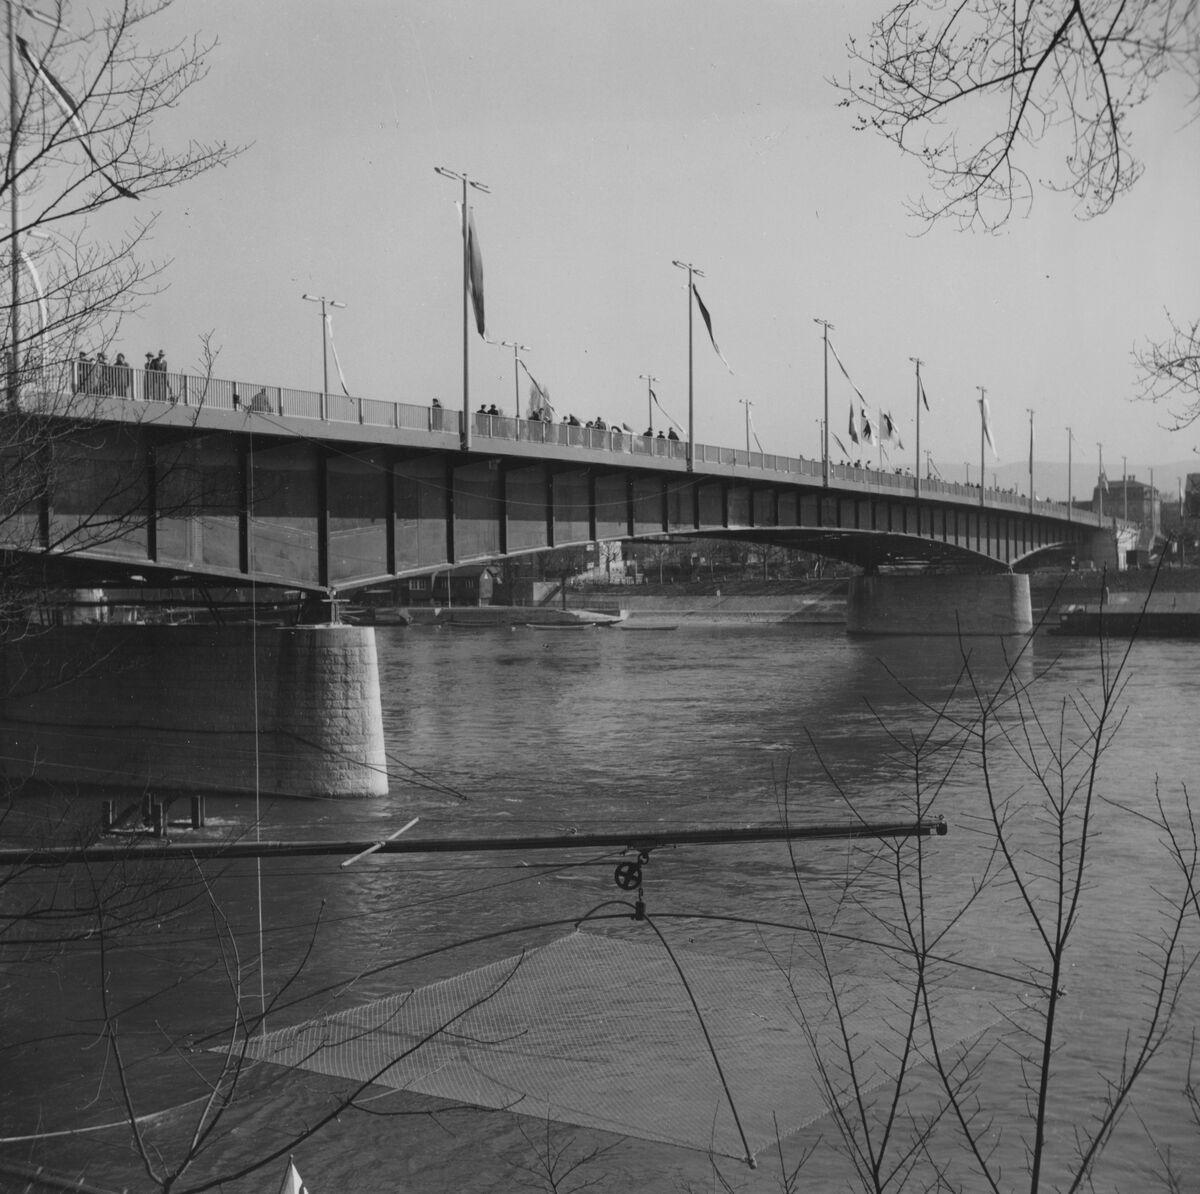 GFA 20/135.189: Stahl- und Brückenbau: St.Albanbrücke